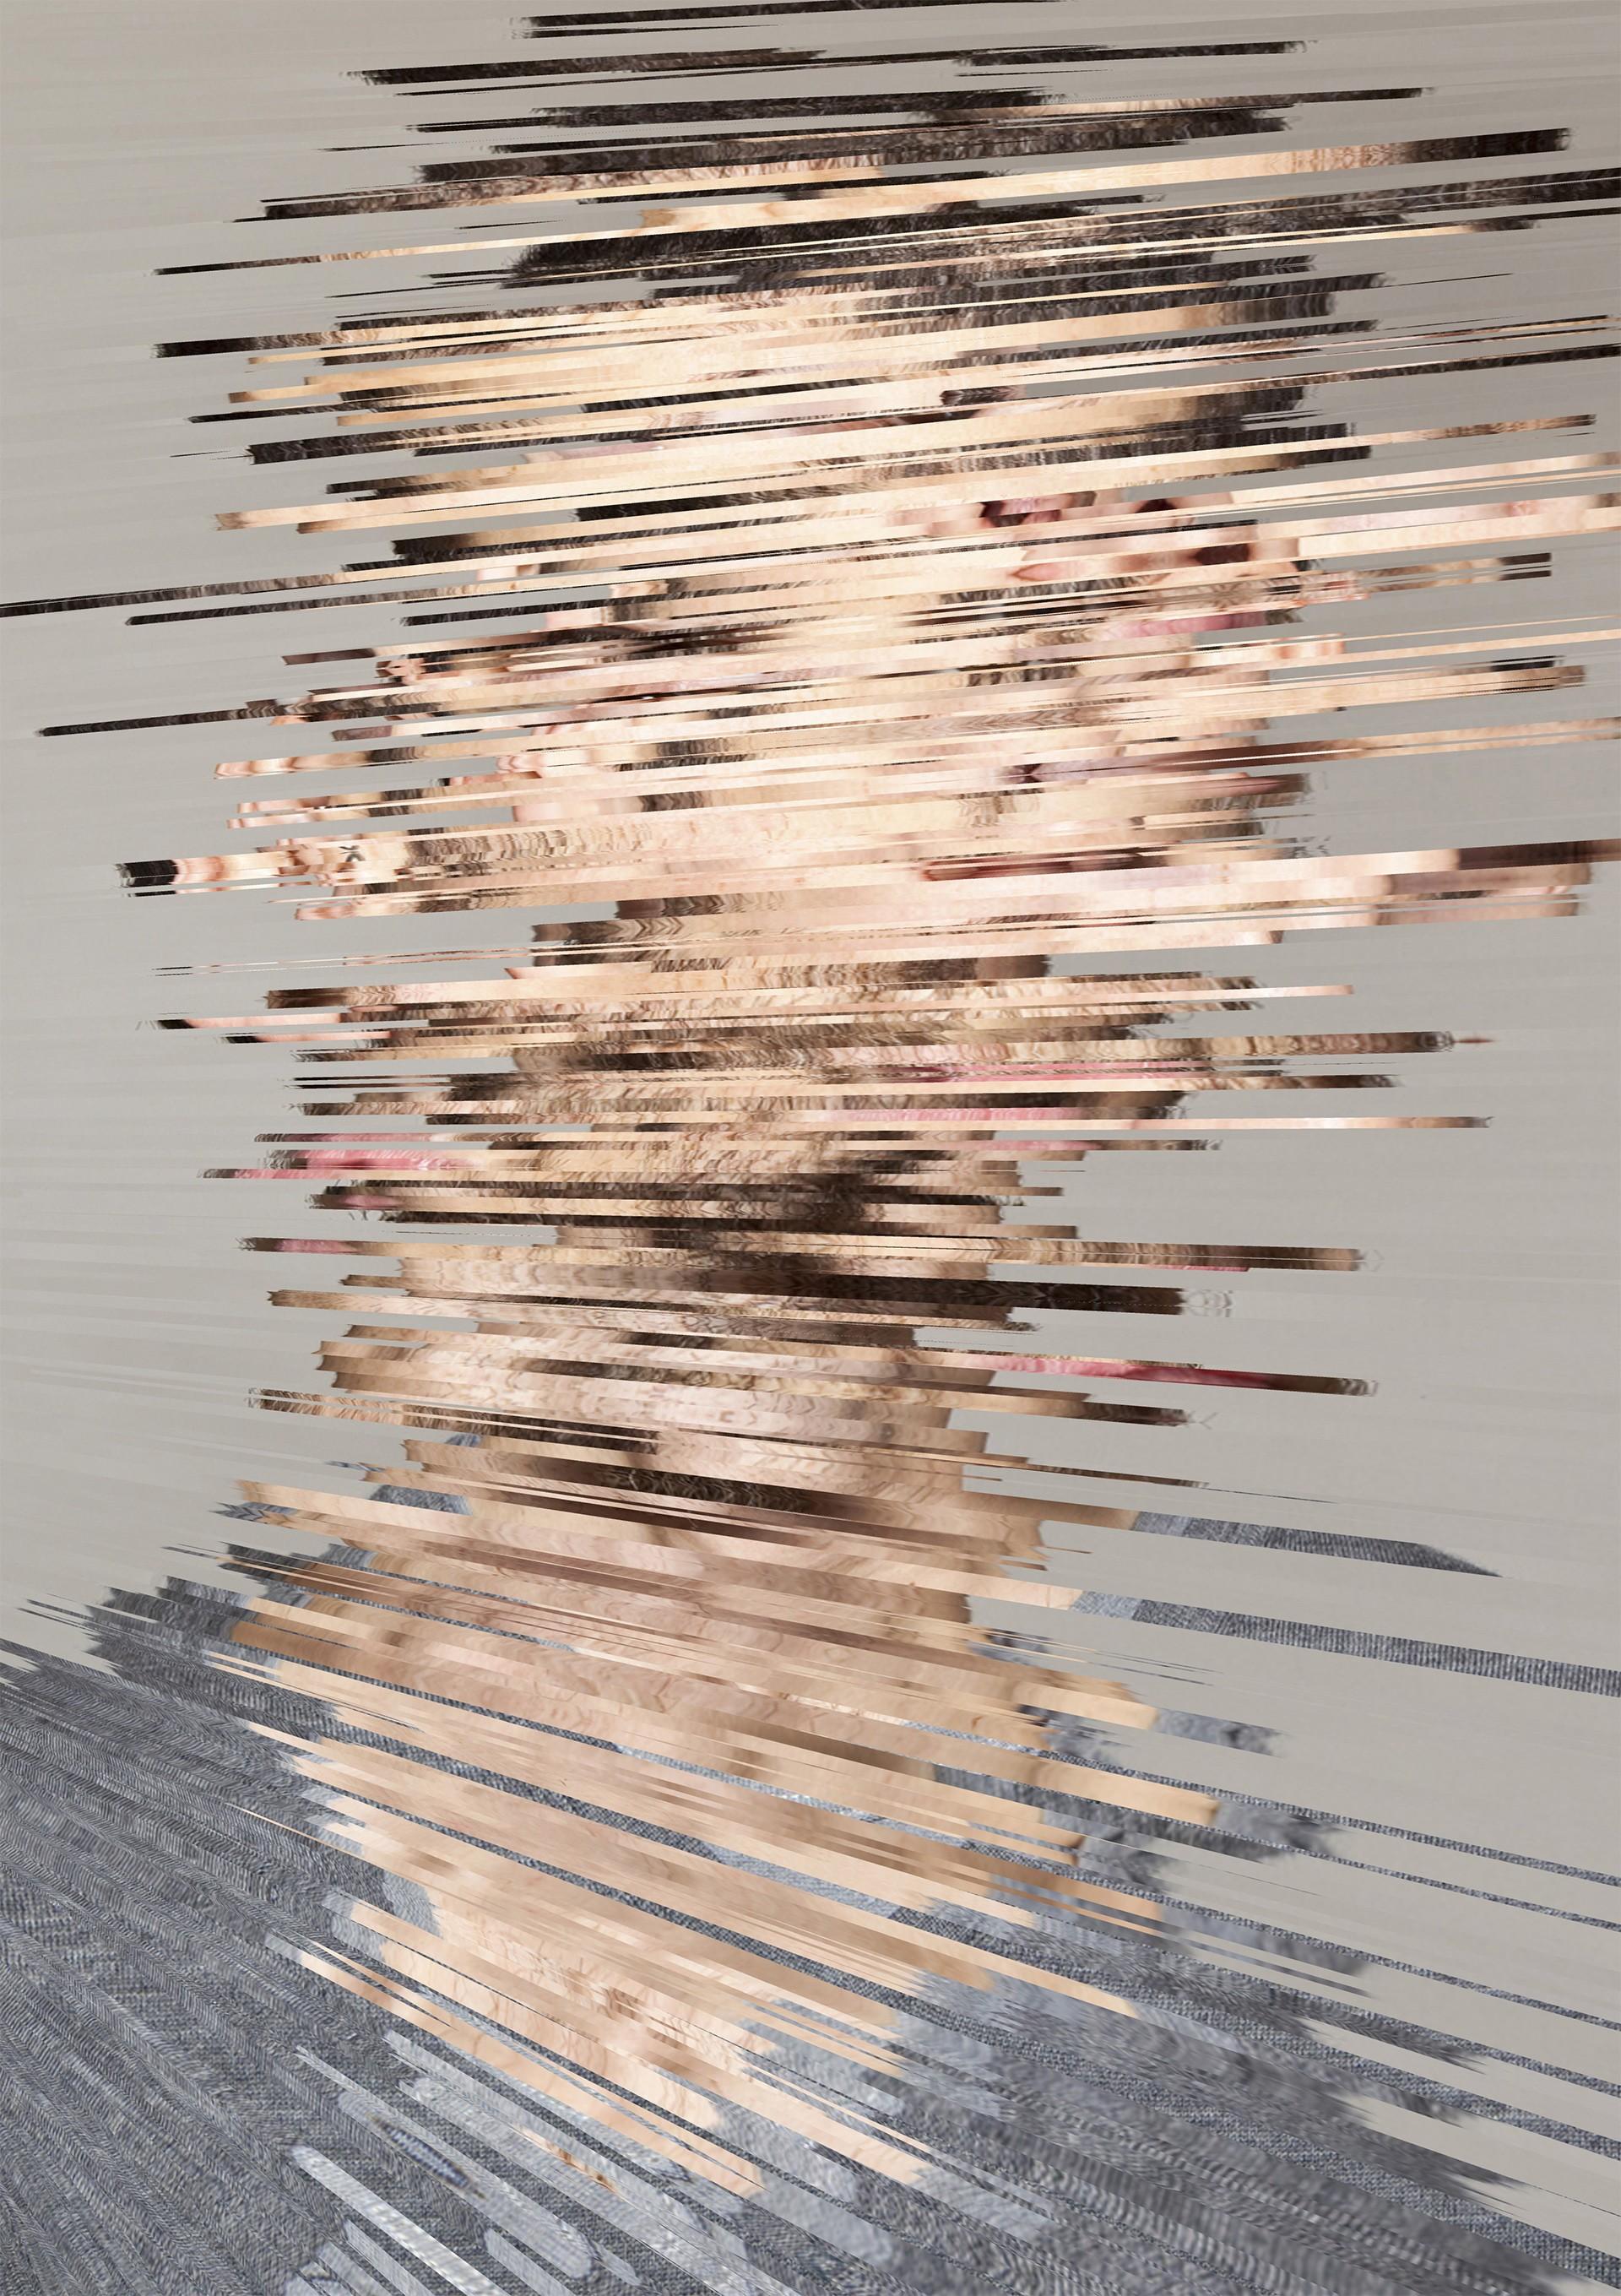 NEOANALOG Digital Ghosts Portraits